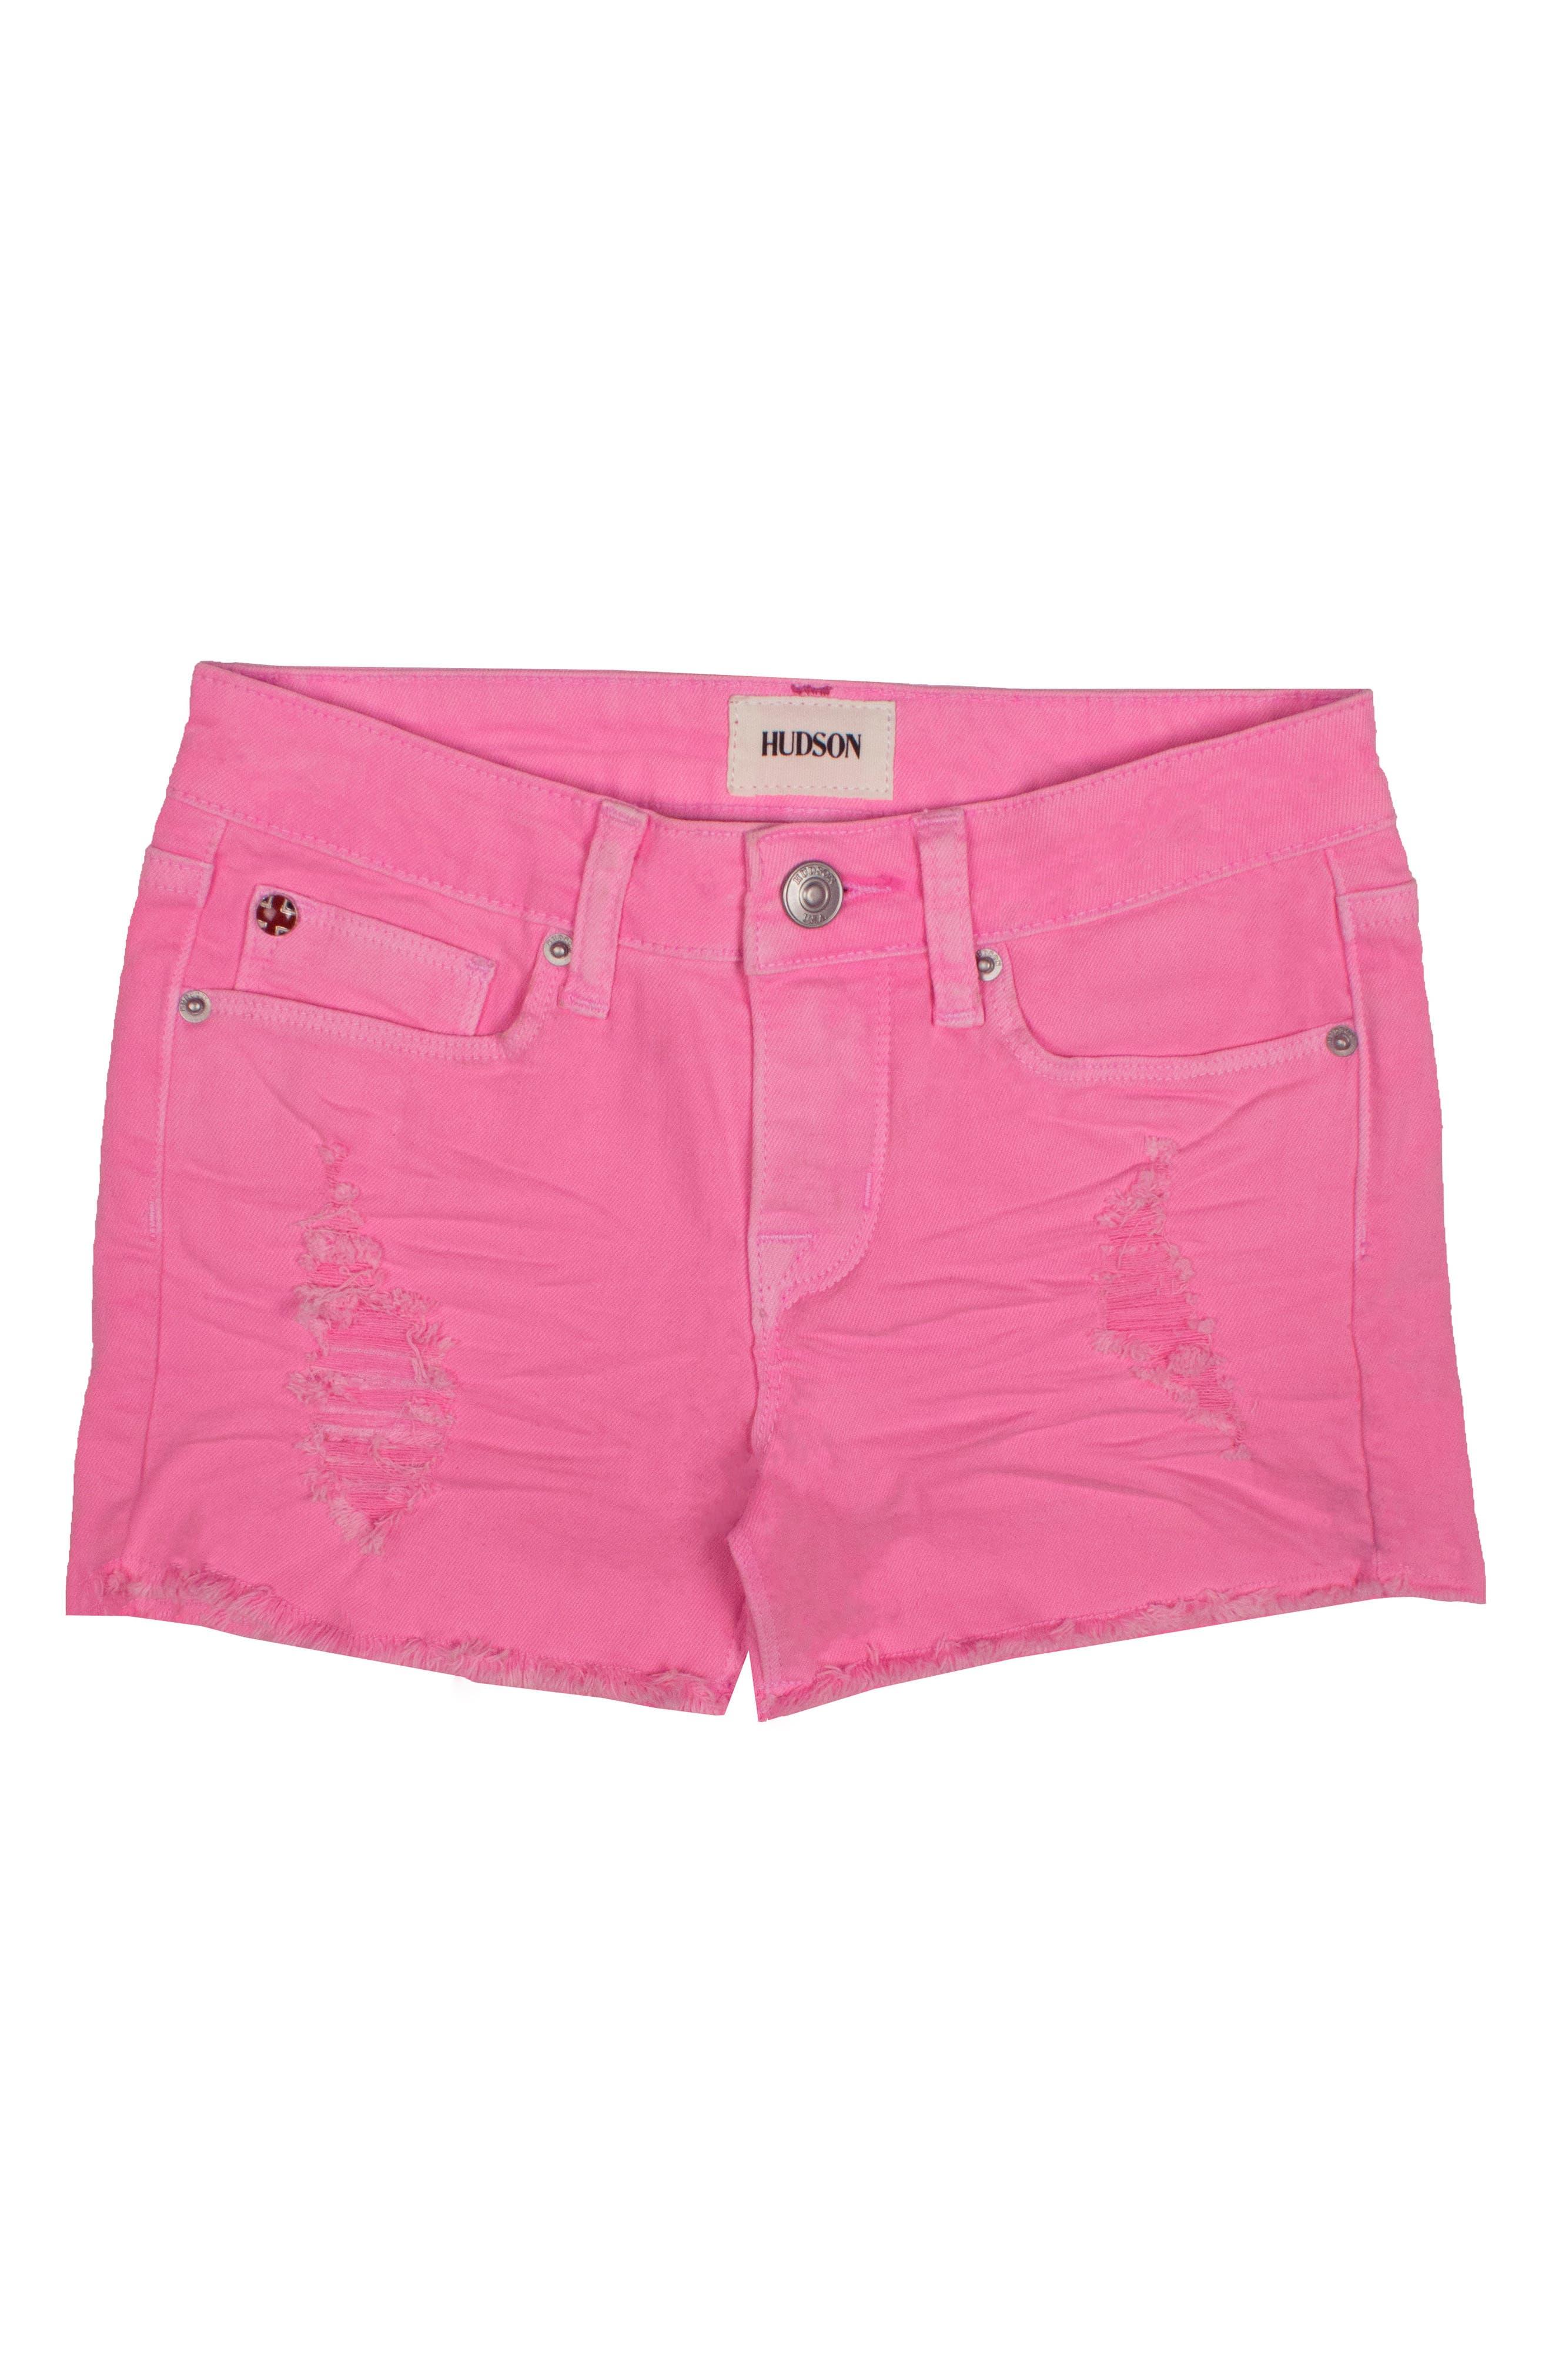 Main Image - Hudson Kids Ava Shorts (Baby Girls)